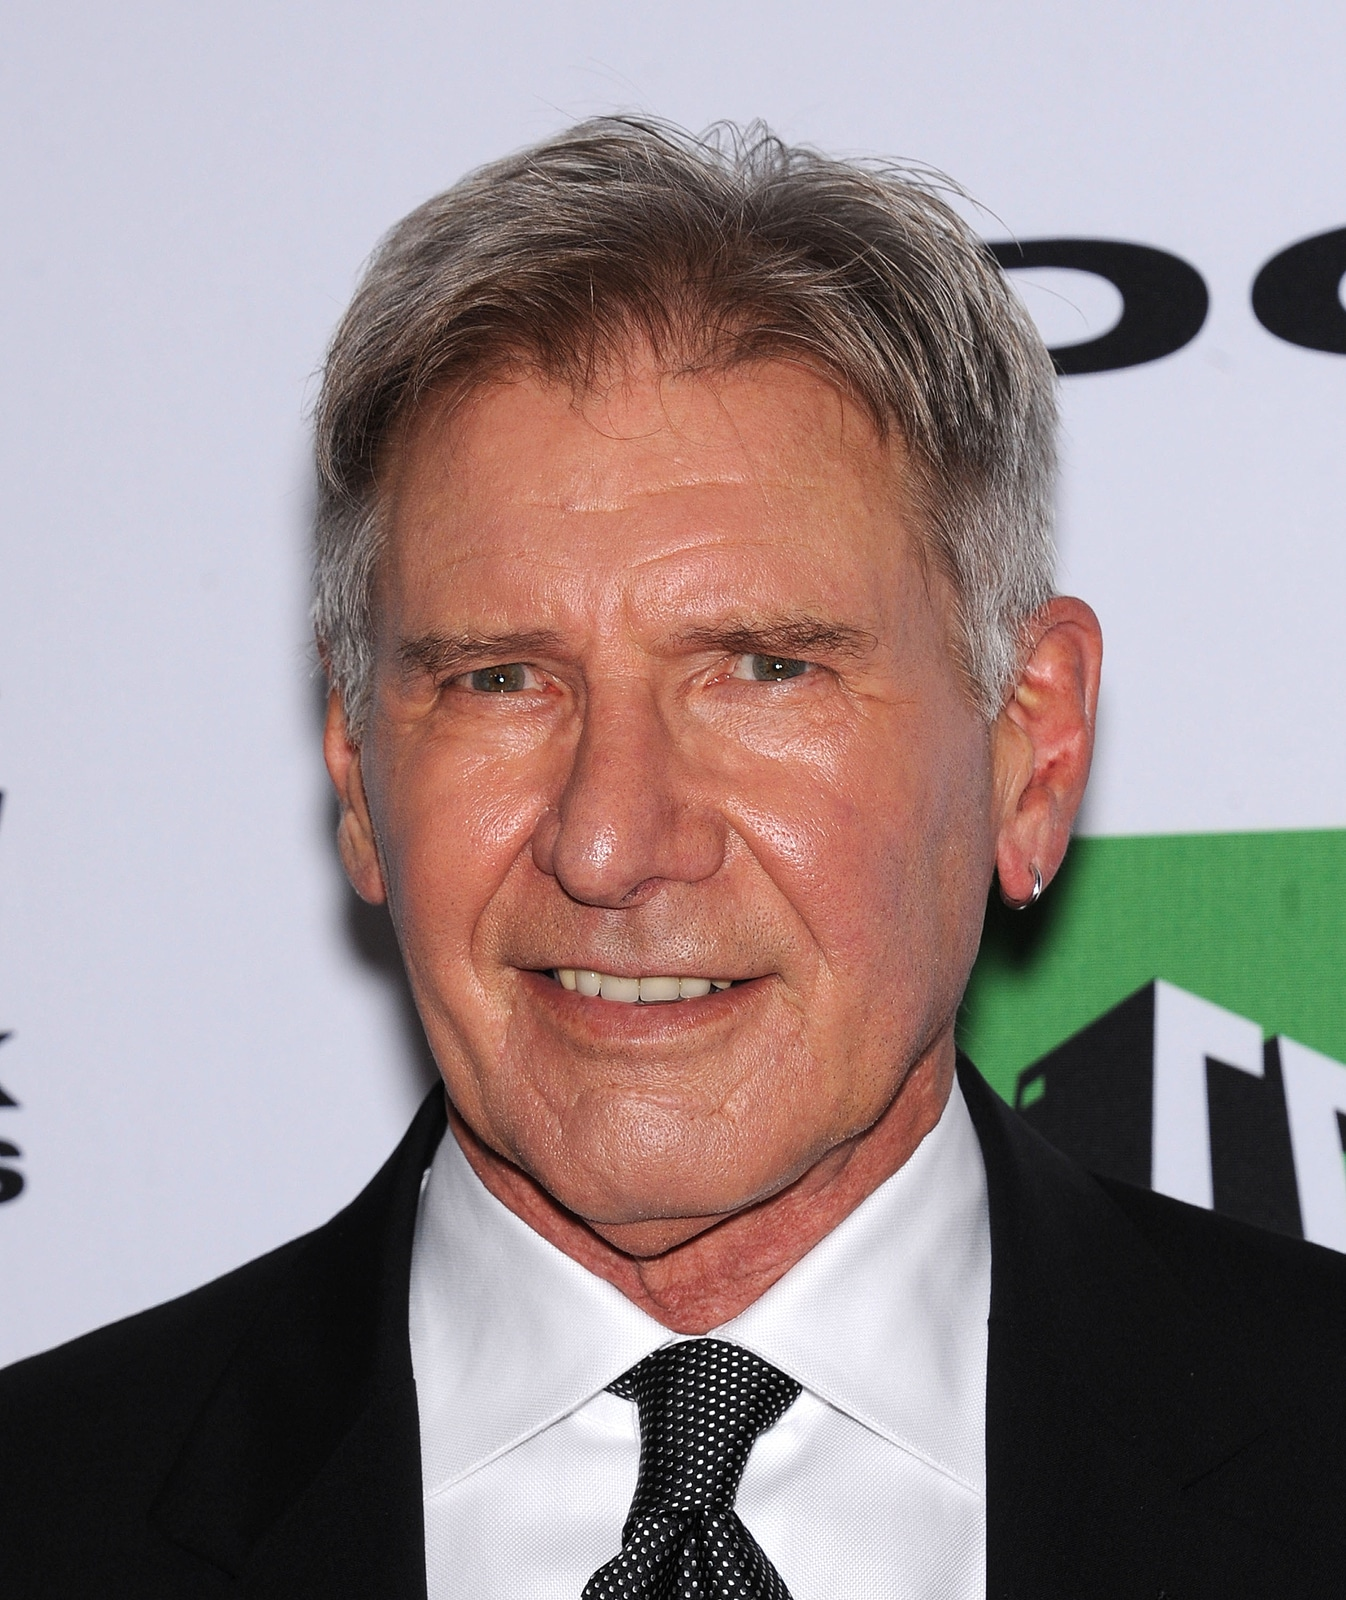 accidente aéreo de Harrison Ford